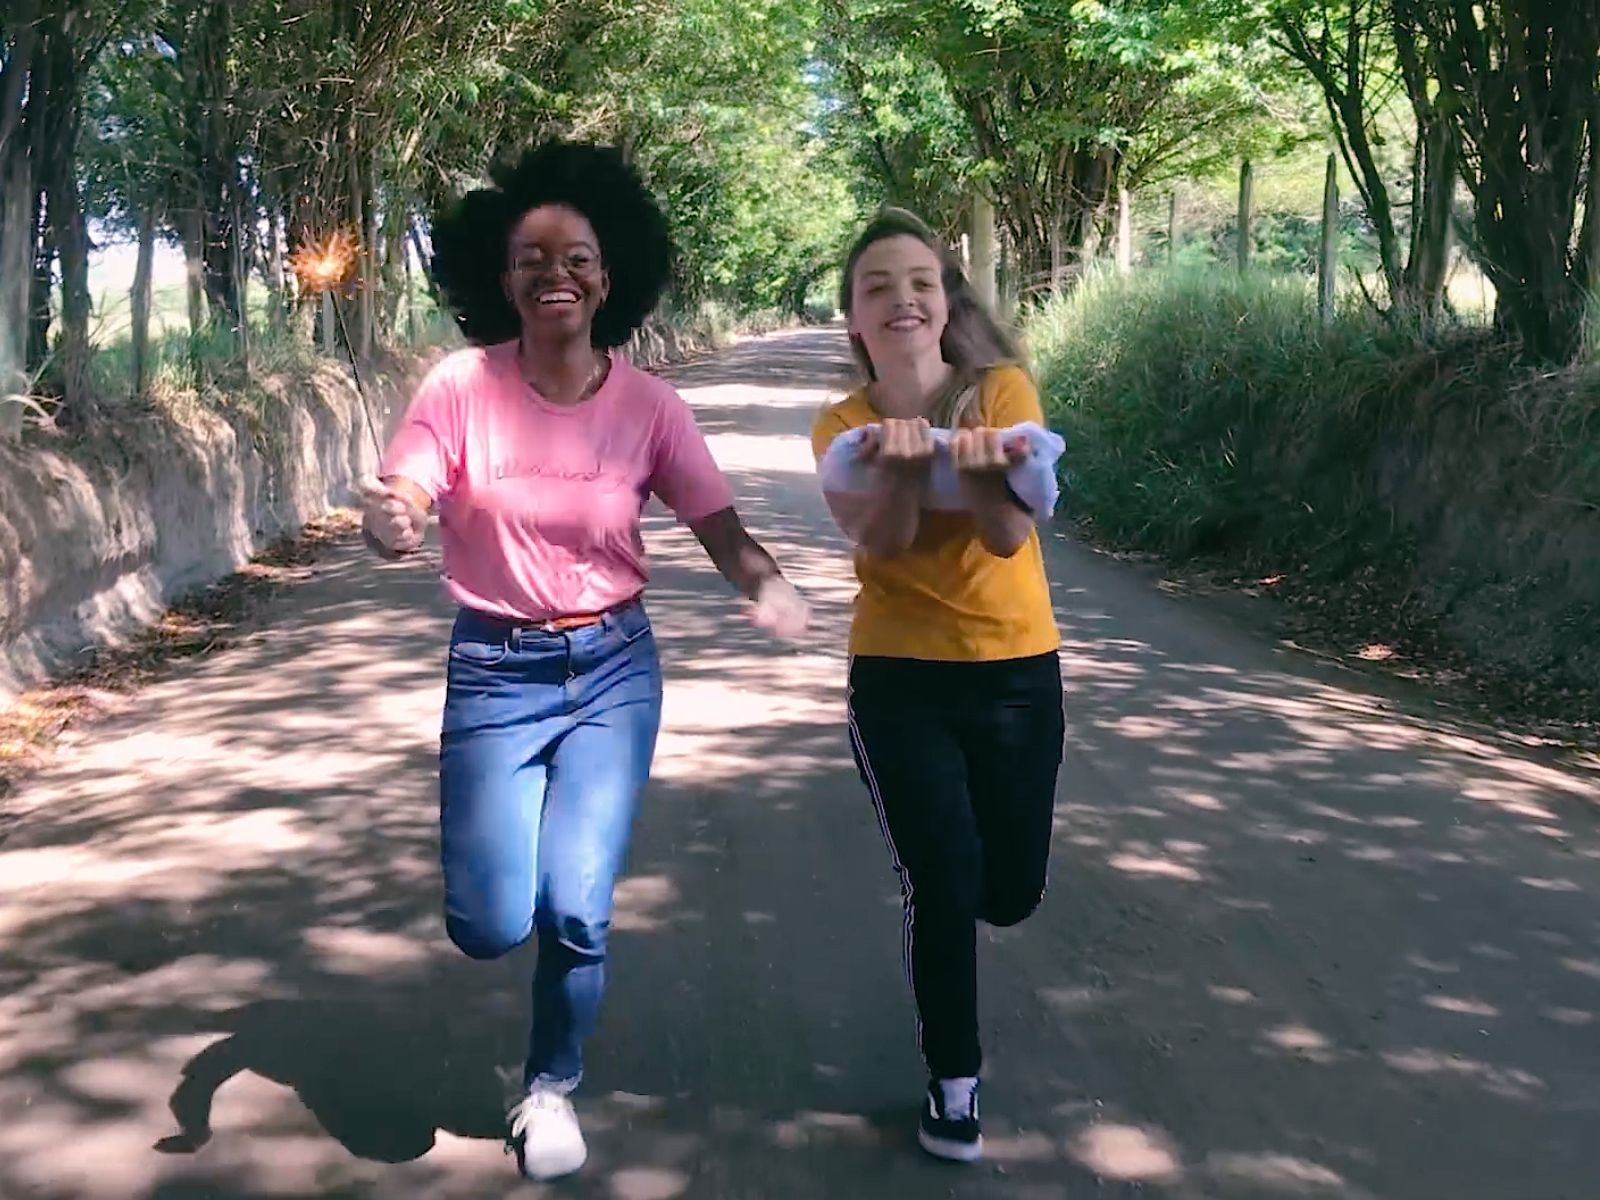 Jovens correndo